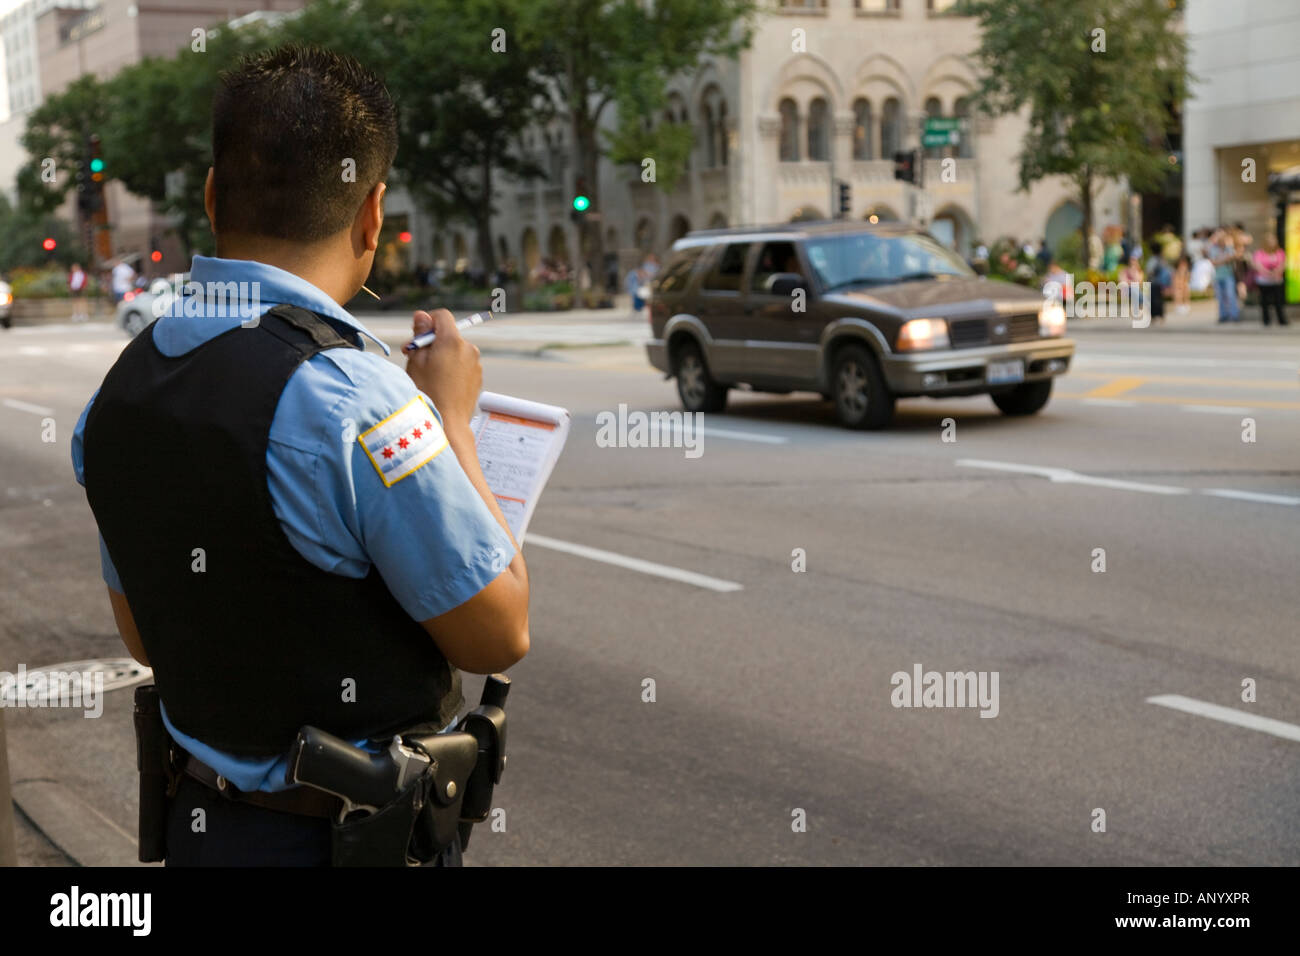 chicago police officer photos chicago police officer images alamy. Black Bedroom Furniture Sets. Home Design Ideas